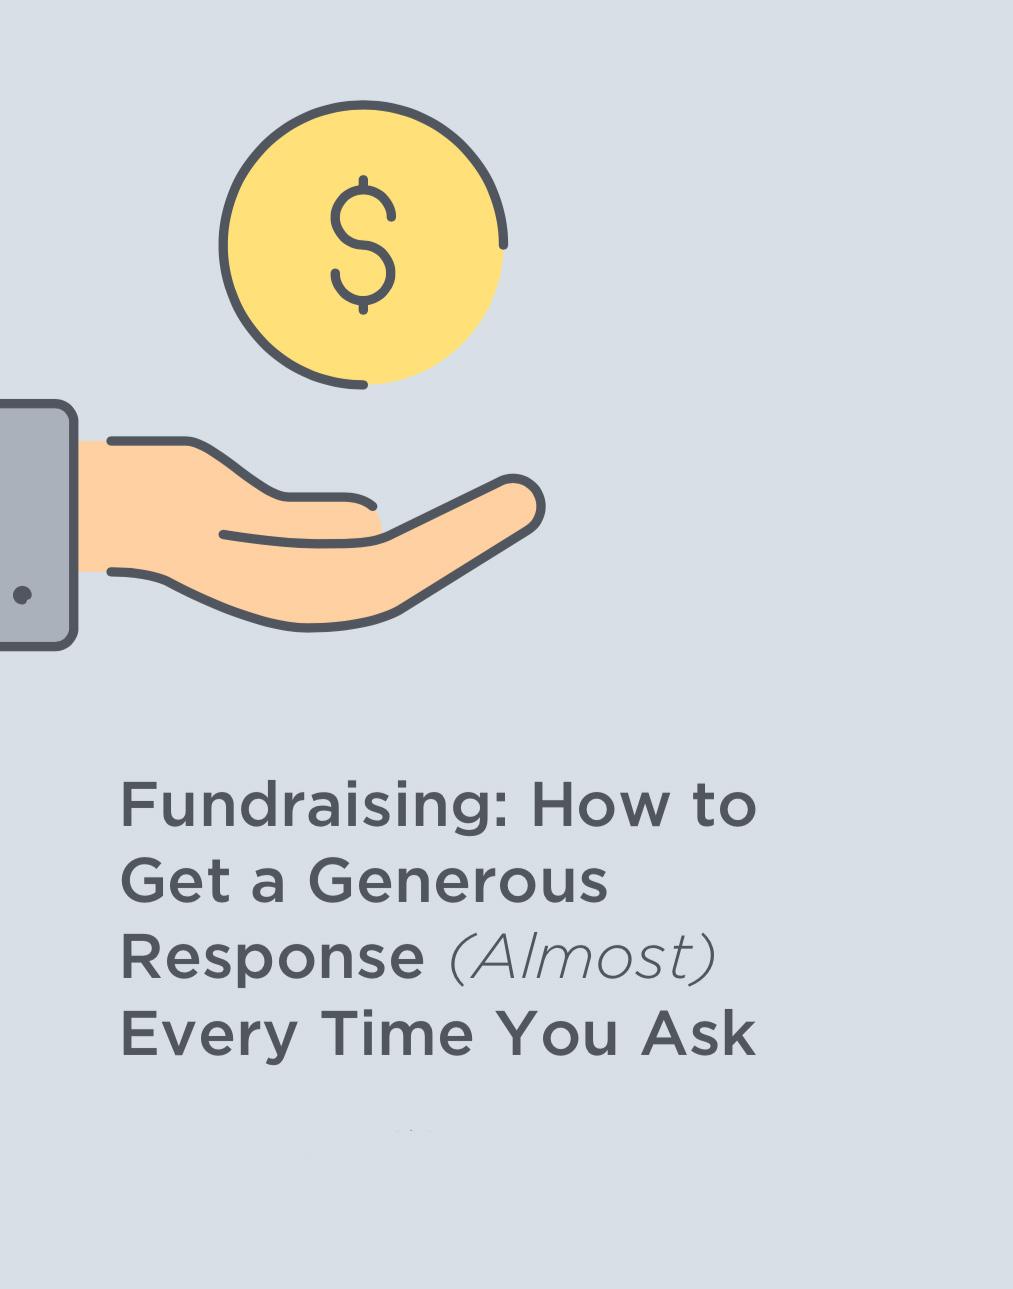 get-a-generous-response-fundraising.jpg